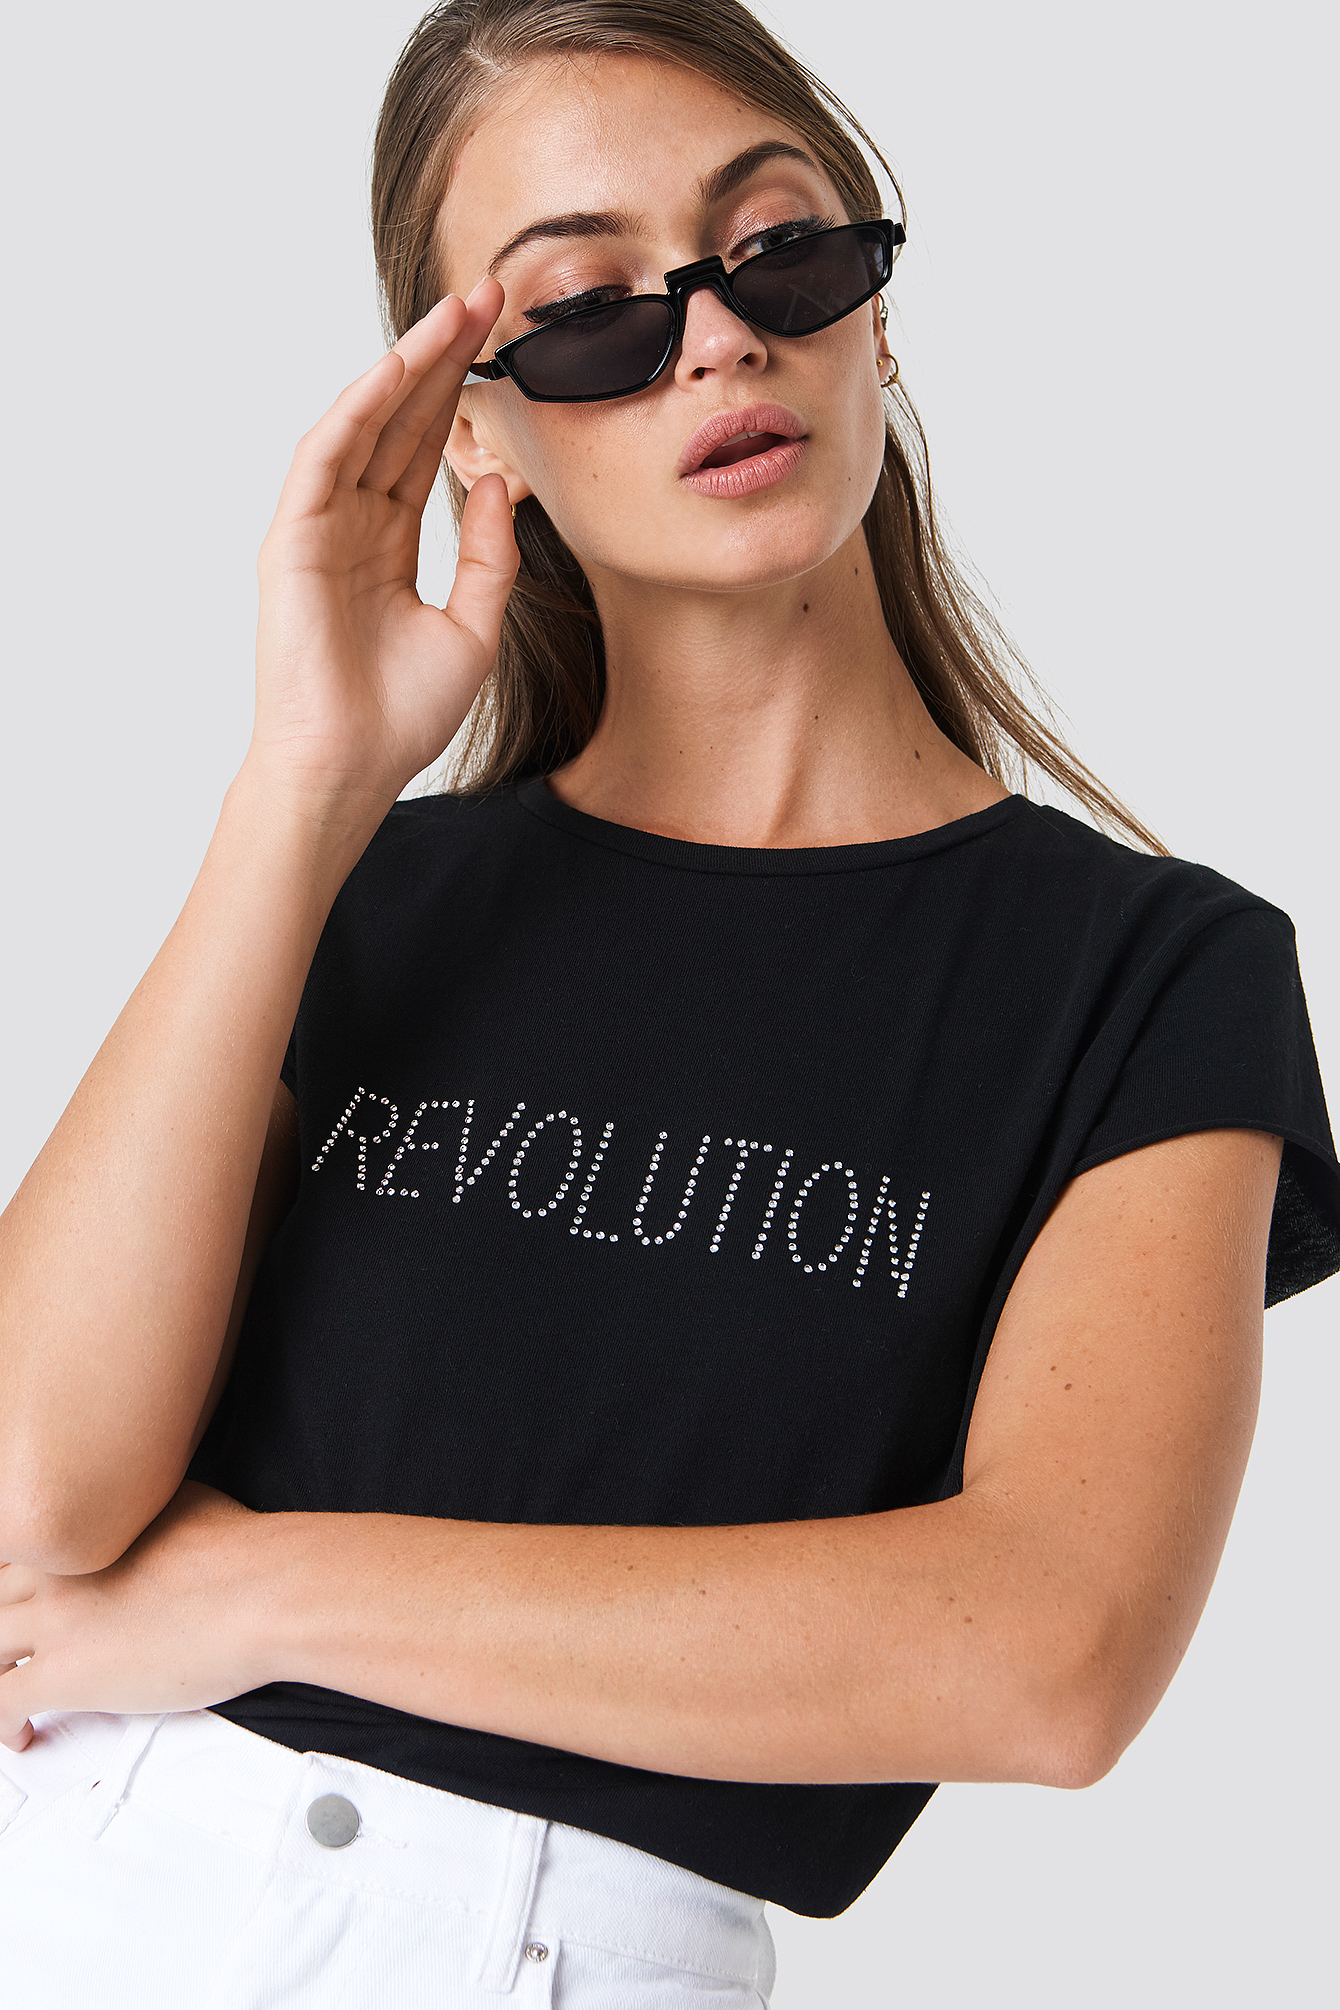 Revolution Glittery Tee NA-KD.COM